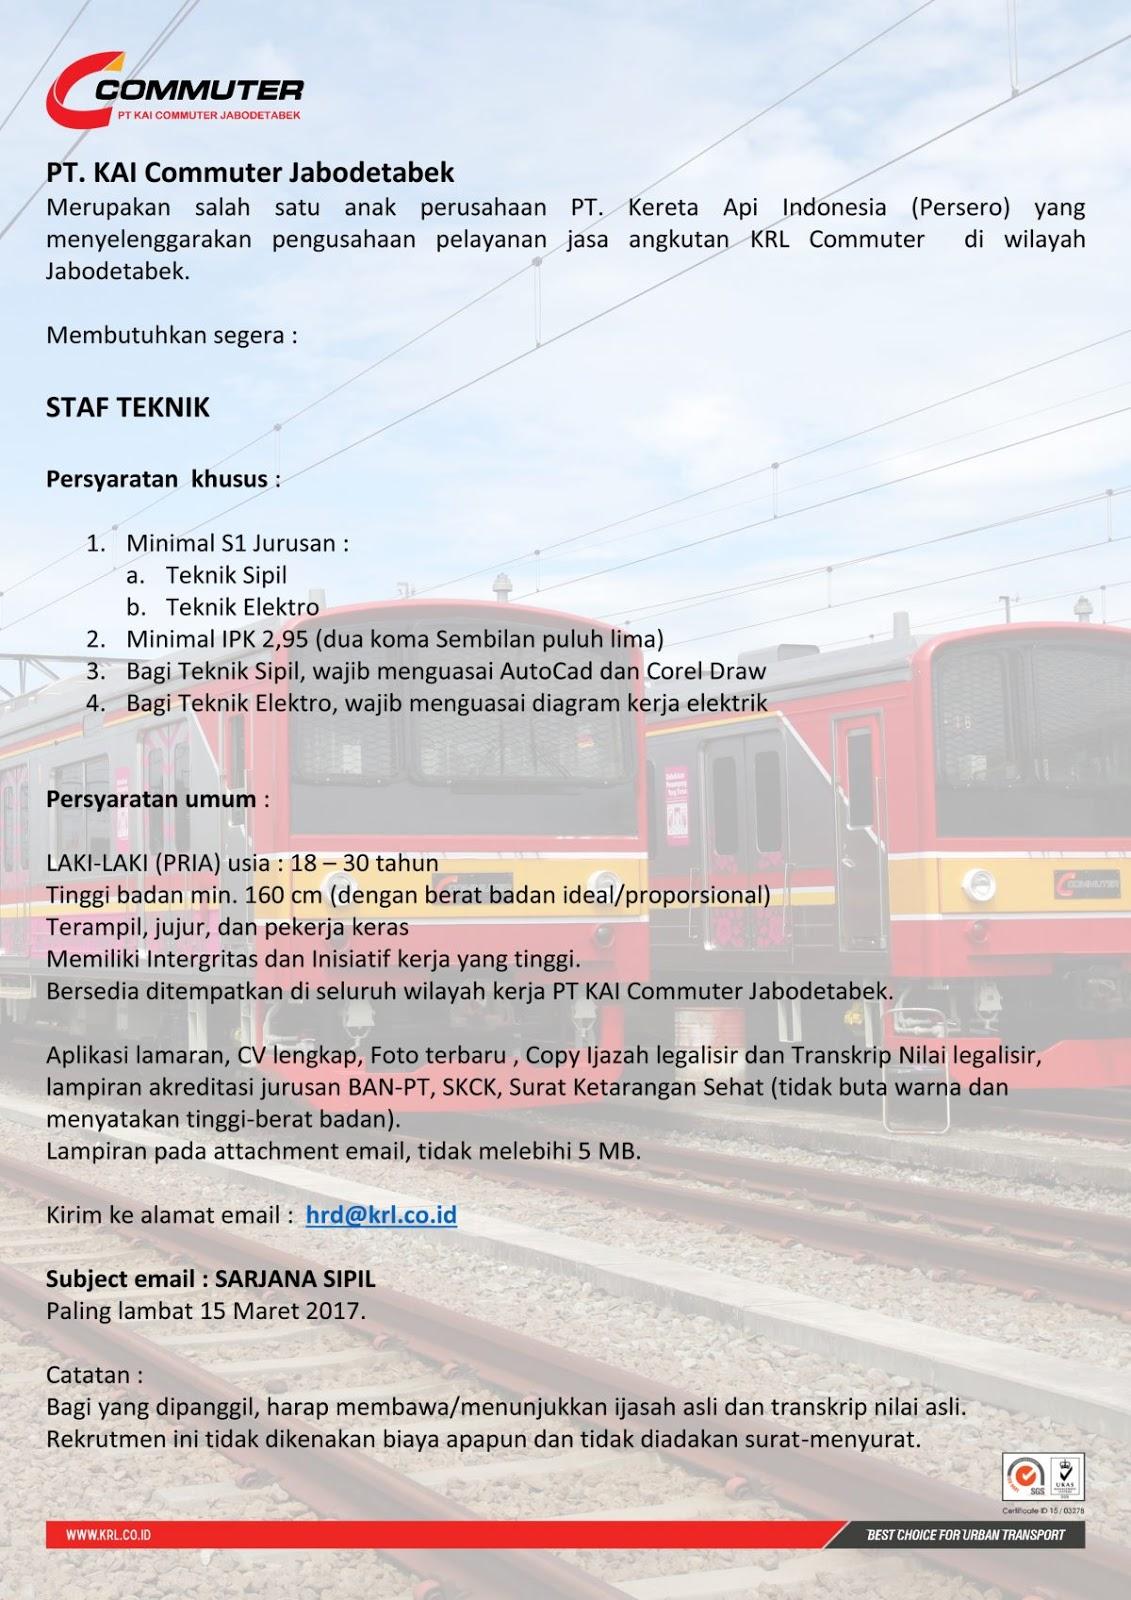 loker kai commuter staff teknik 2017